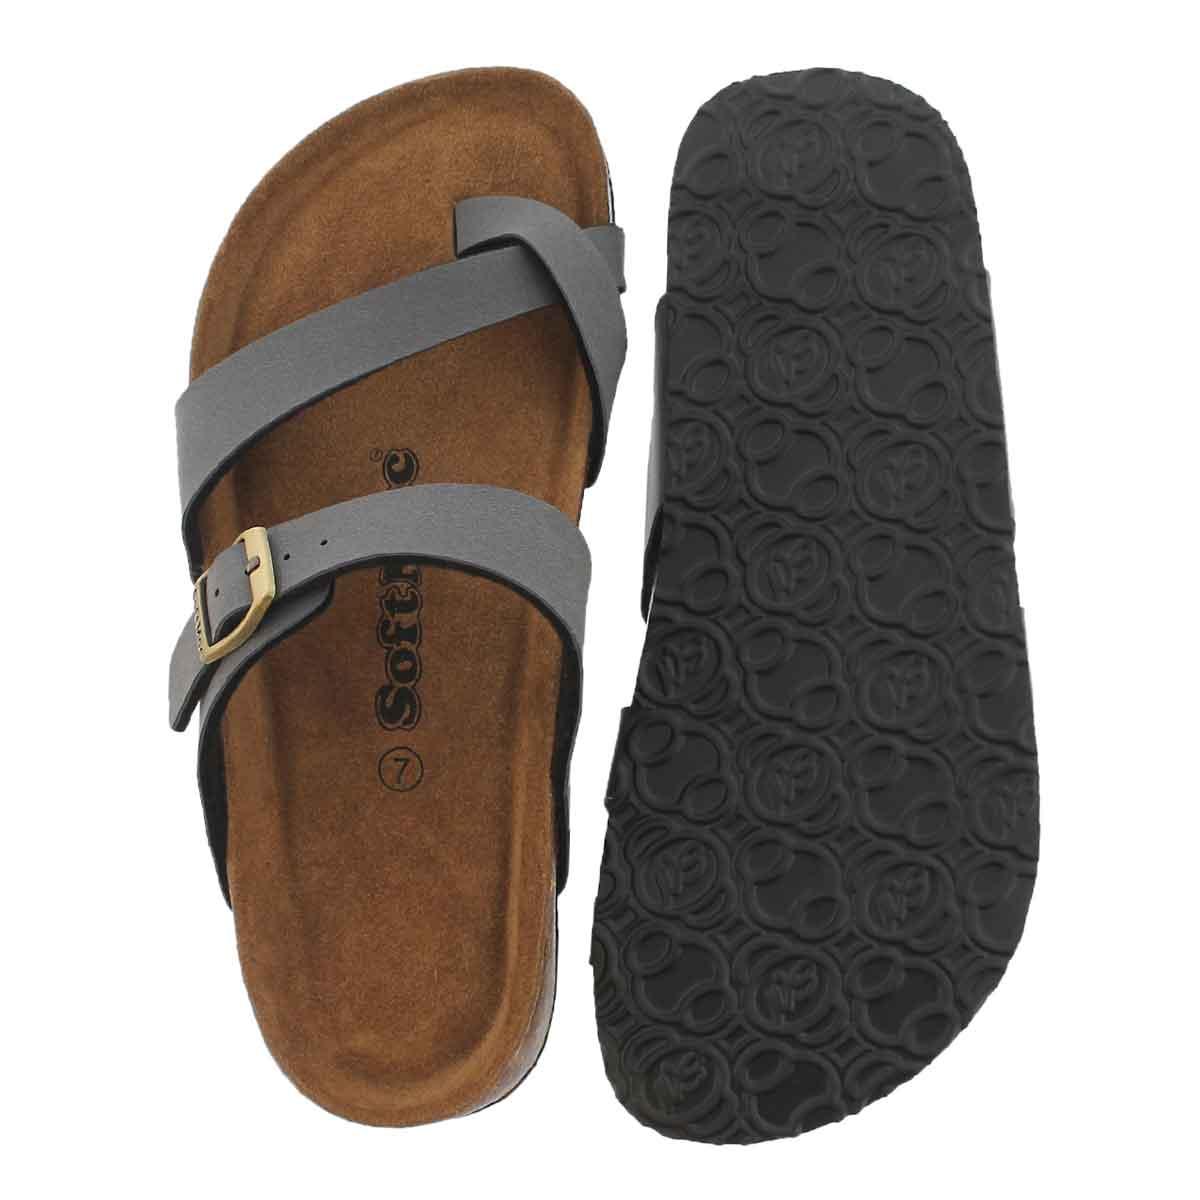 Lds Alicia 5 PU gry memory foam sandal